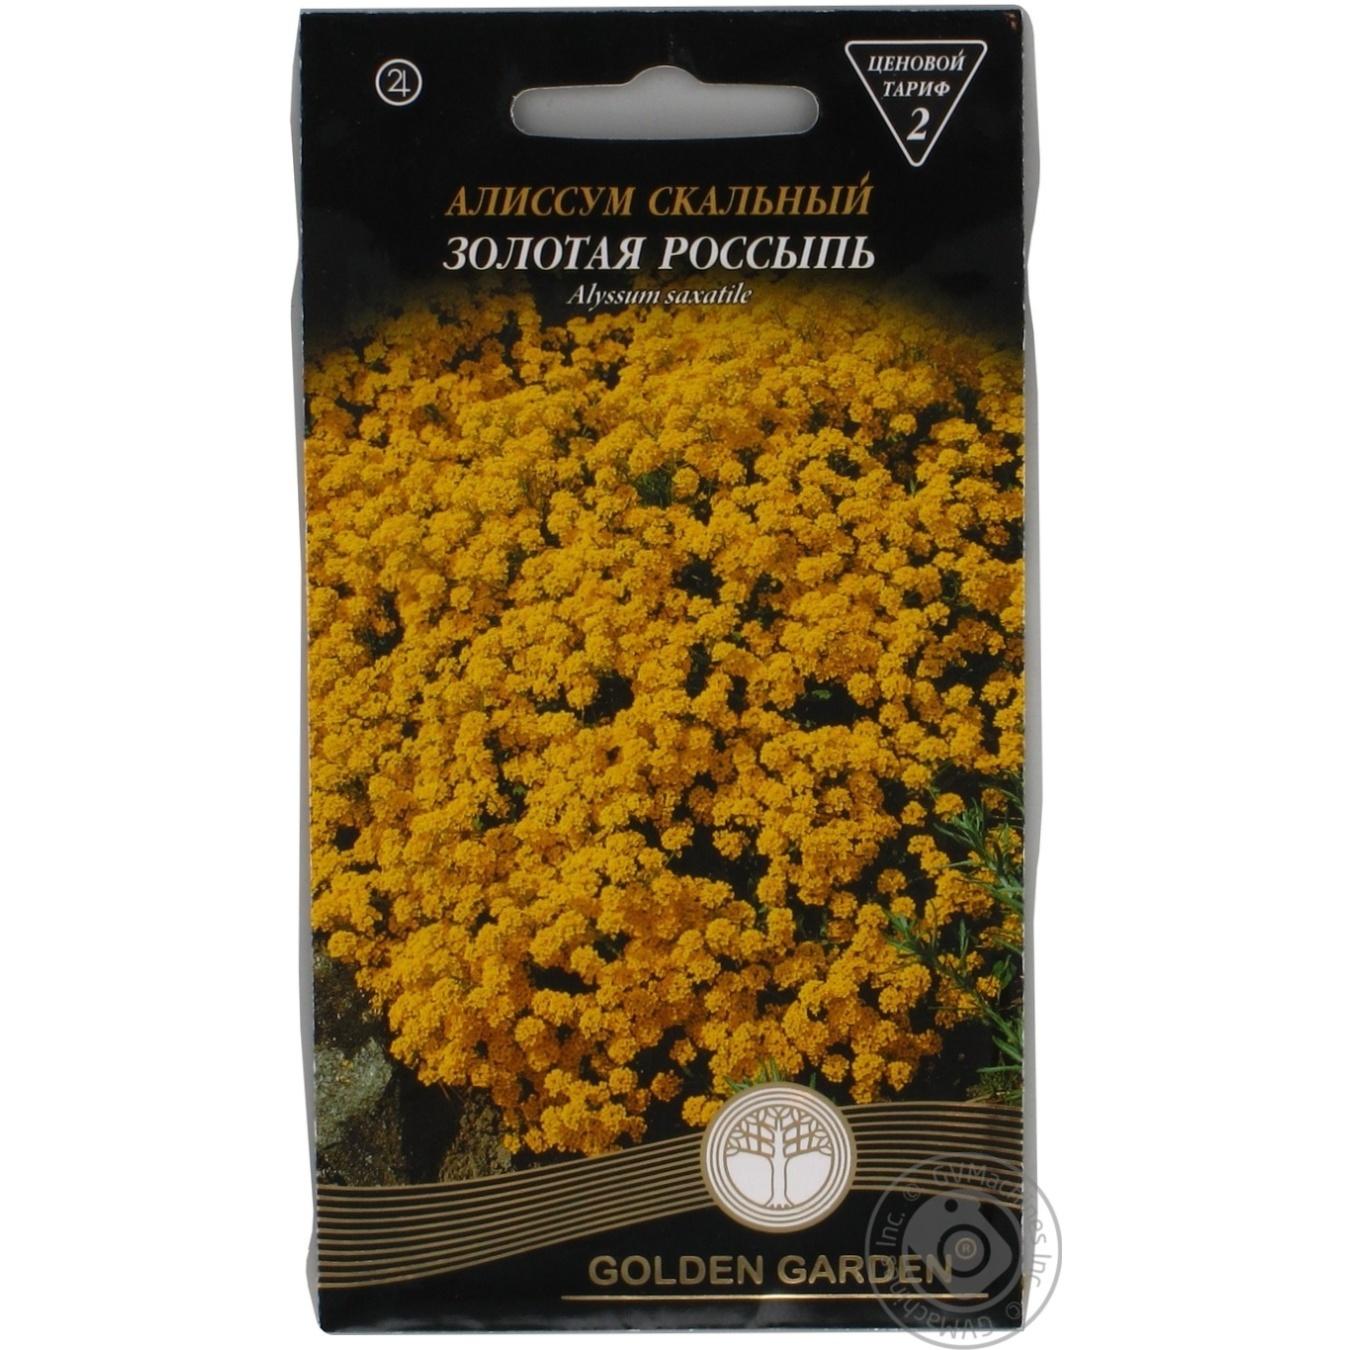 Seed alyssum Golden garden 0.2g → Household → Hobby and rest ...